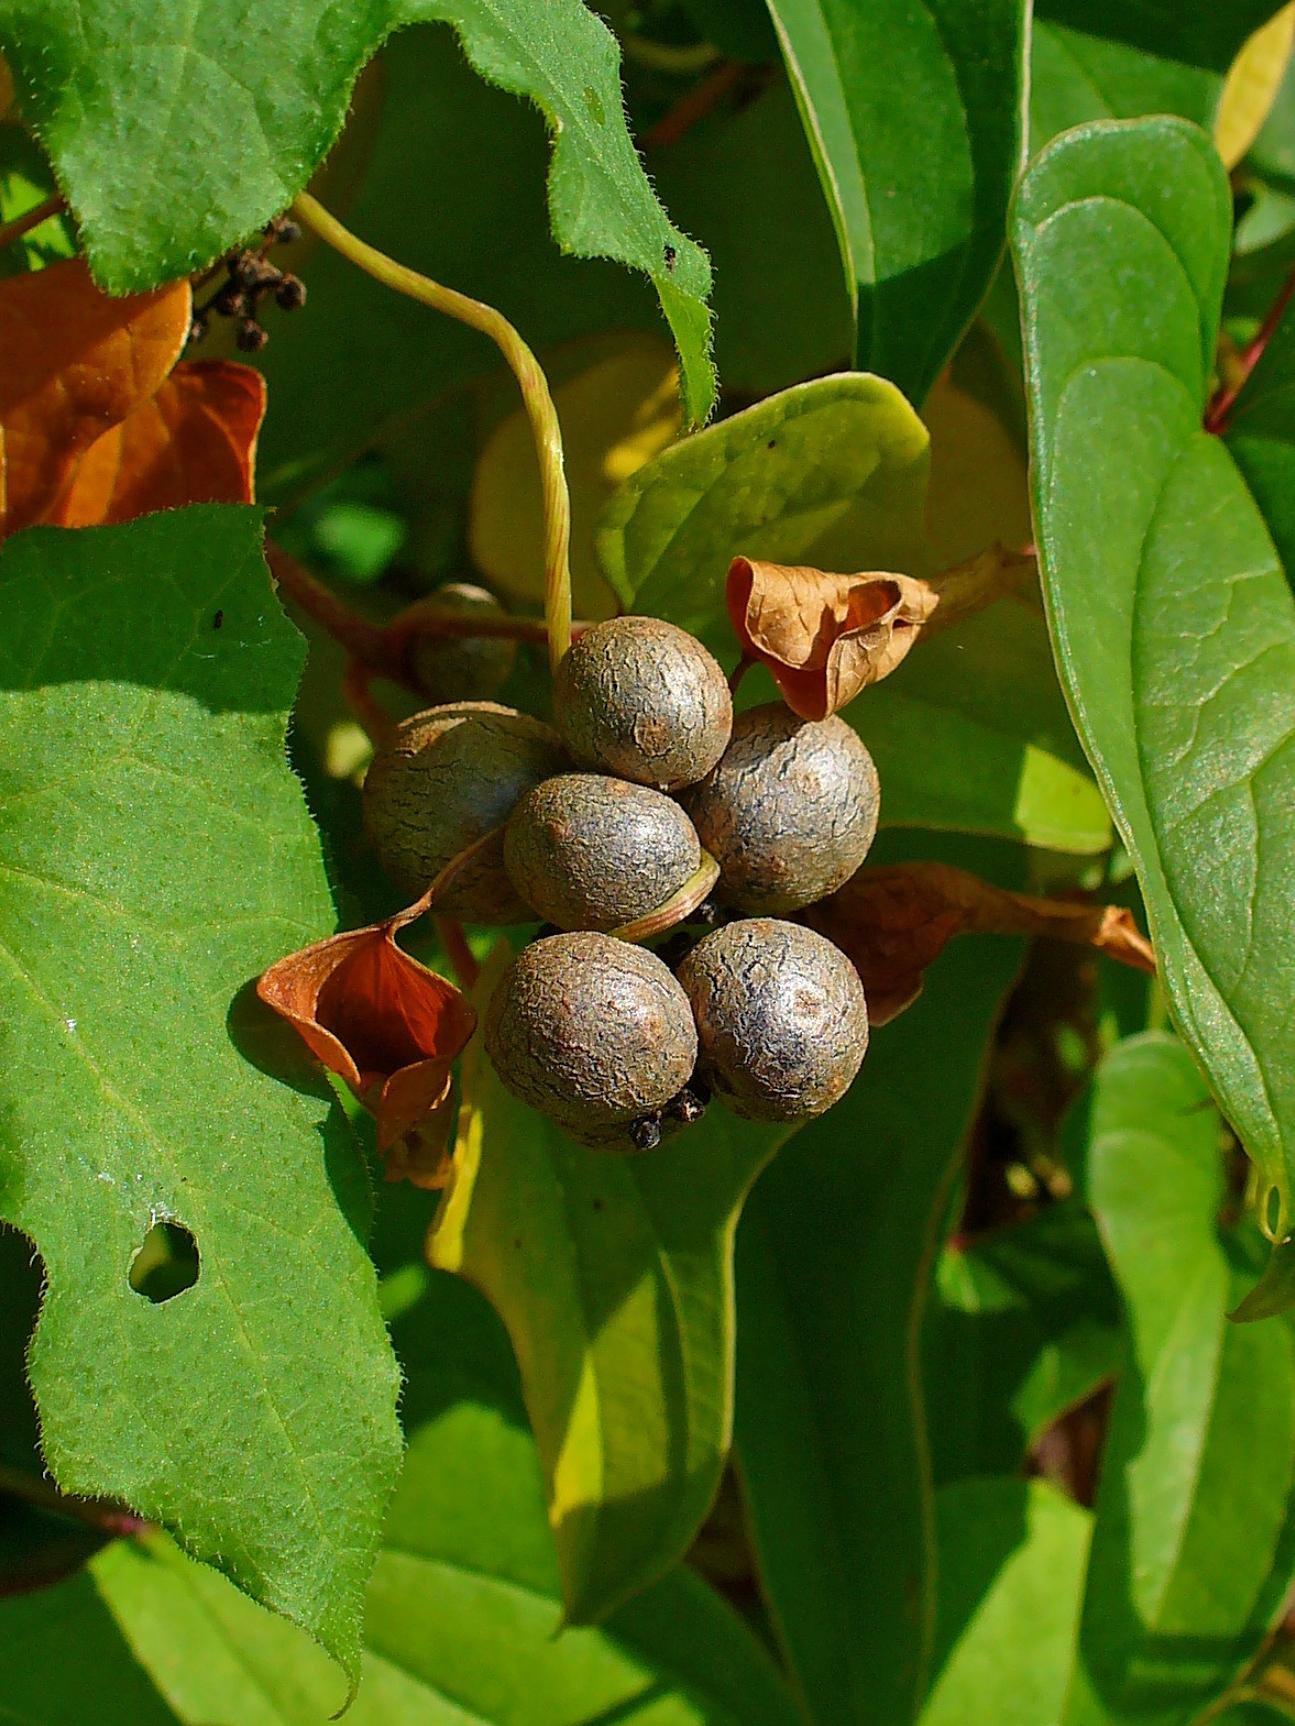 File:Dioscorea polystachya 004.jpg - Wikimedia Commons